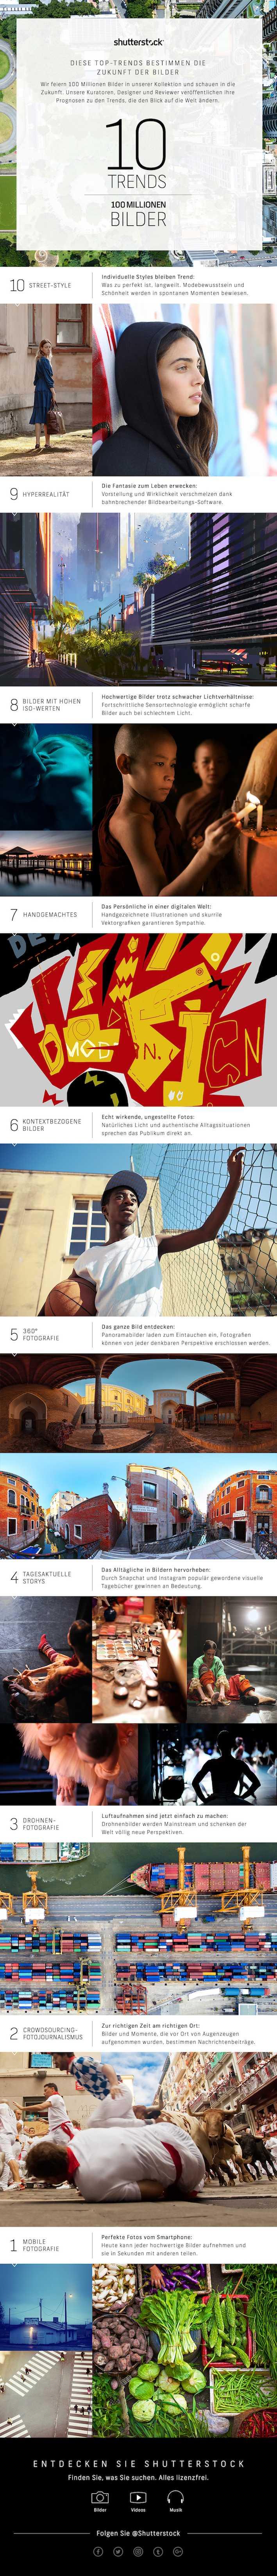 shutterstock-10-trends 100 Millionen Bildern